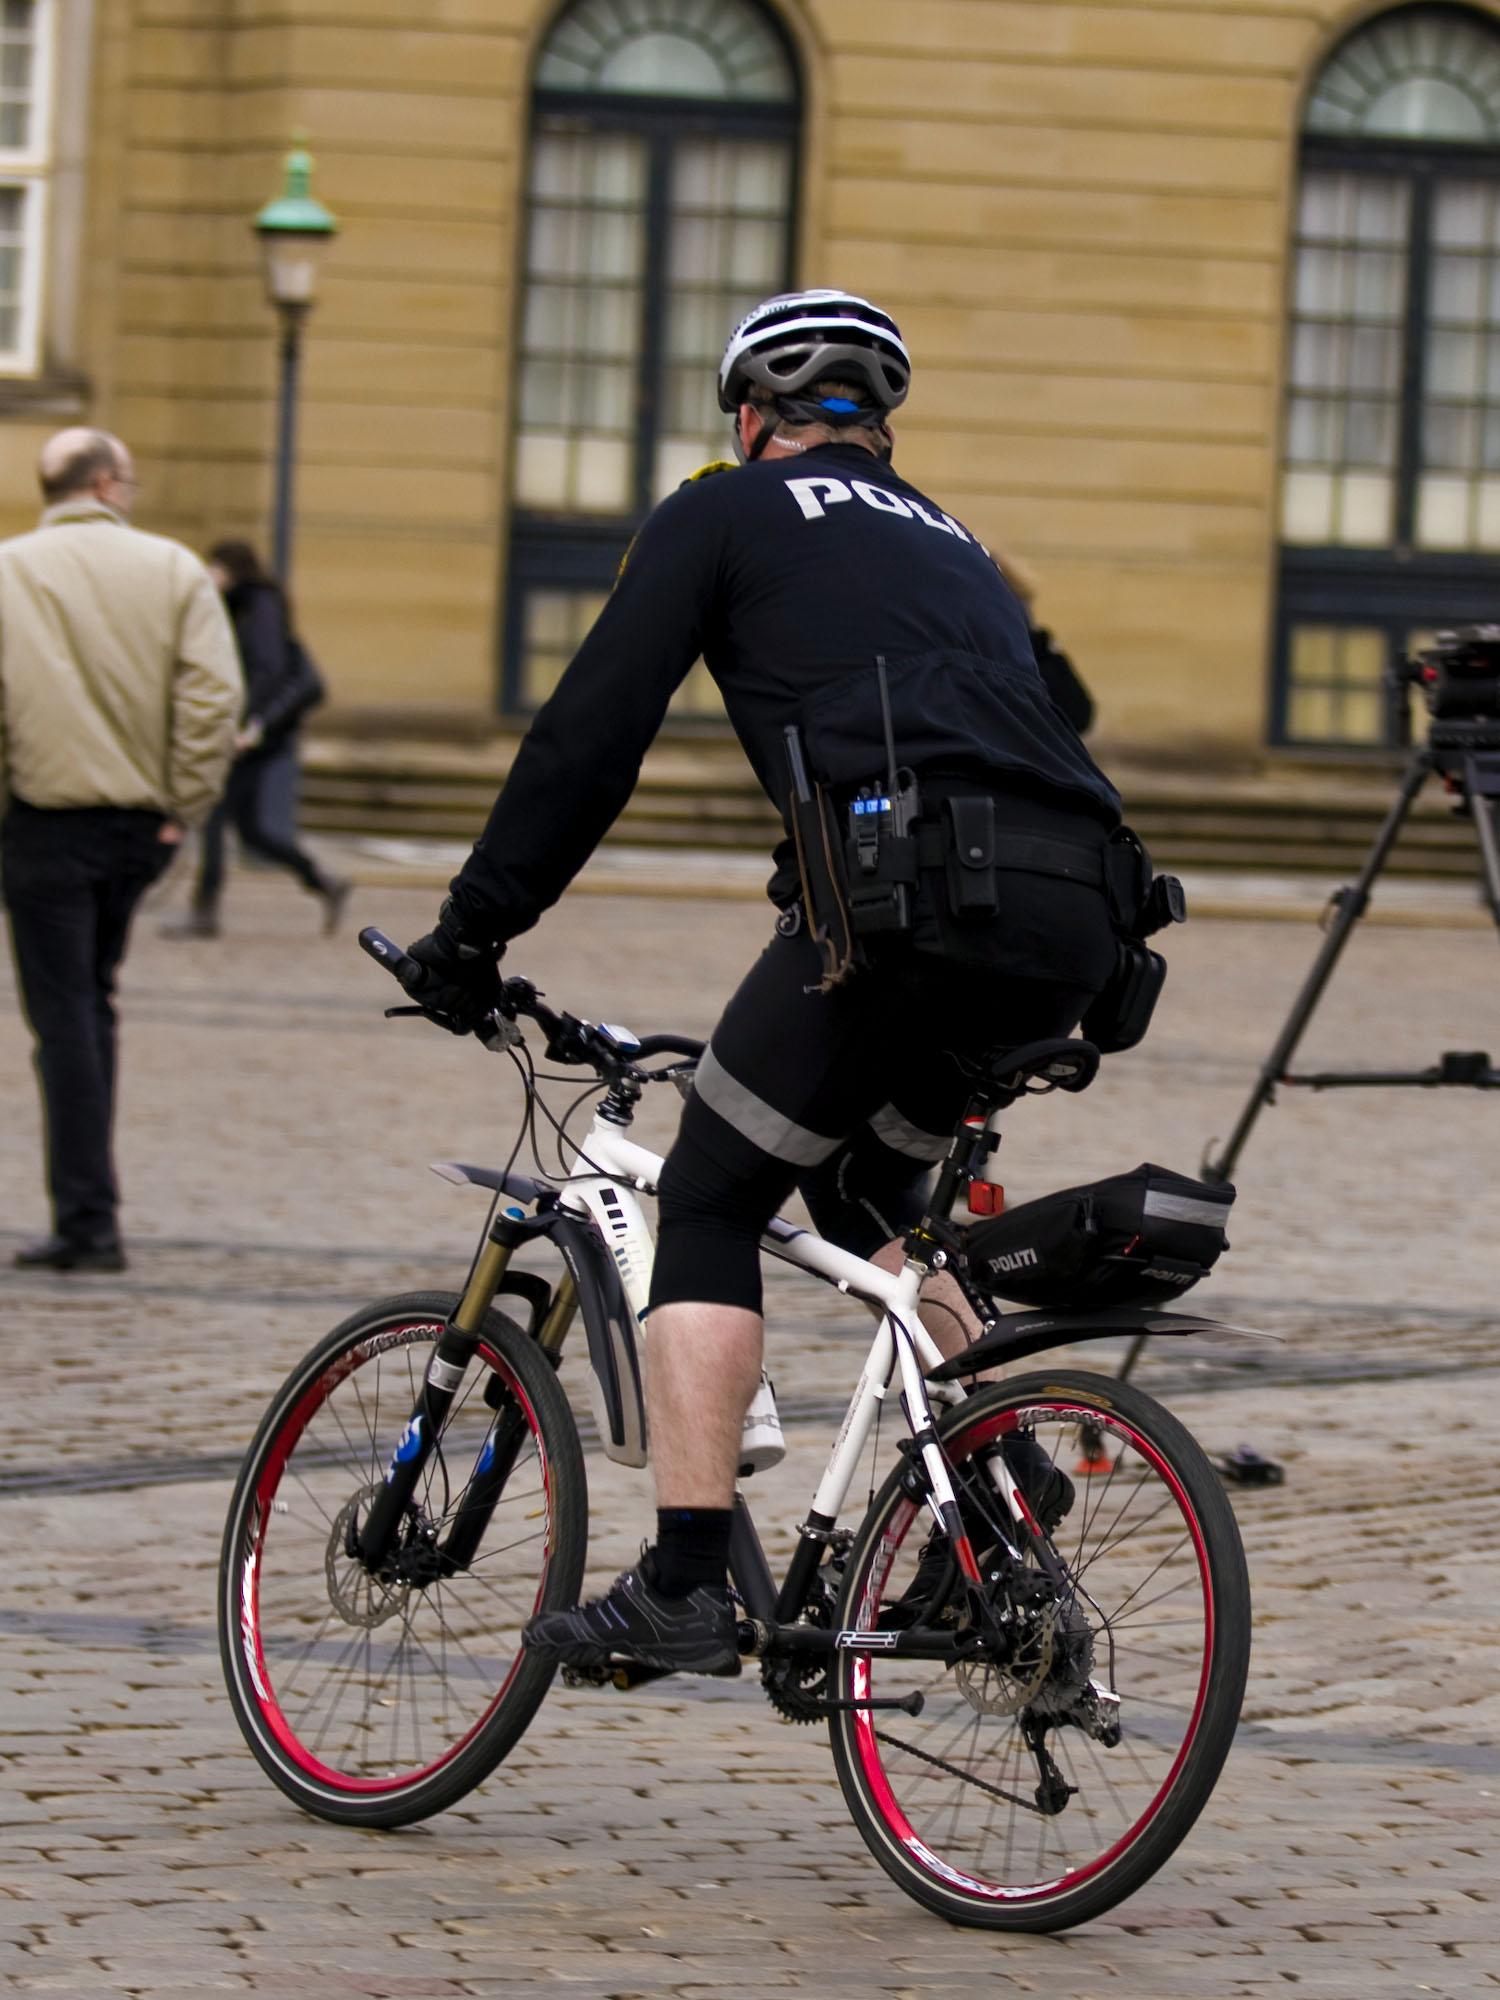 Danish_bicycle_police_2.jpg